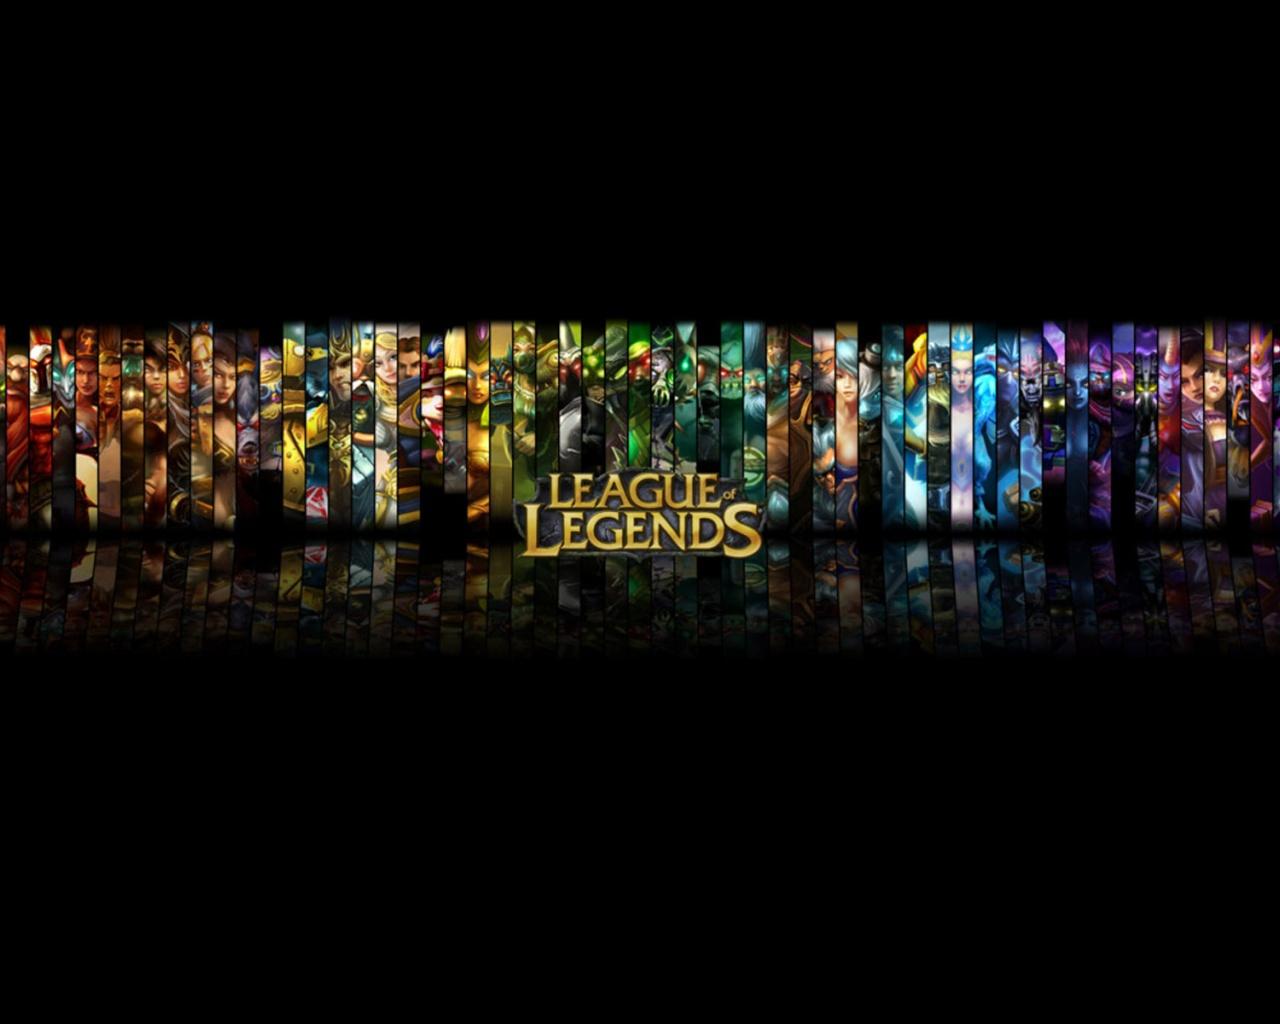 ... League of Legends Black Background desktop PC and Mac wallpaper